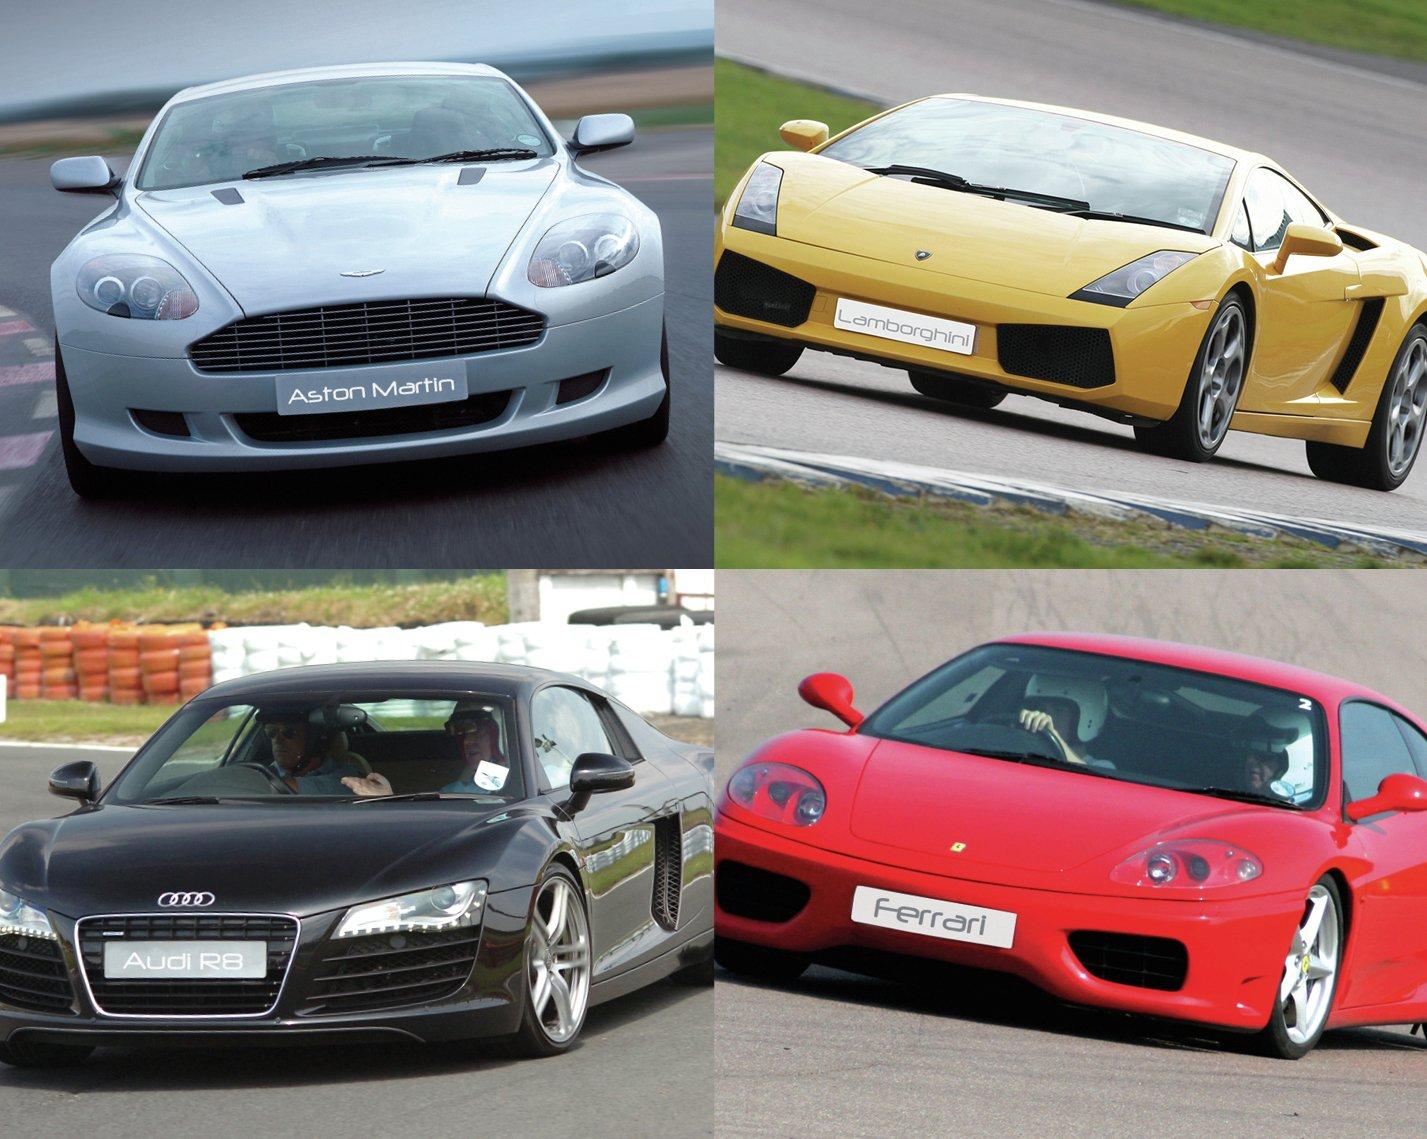 Image of Ferrari, Aston Martin, Lamborghini or Audi R8 Drive